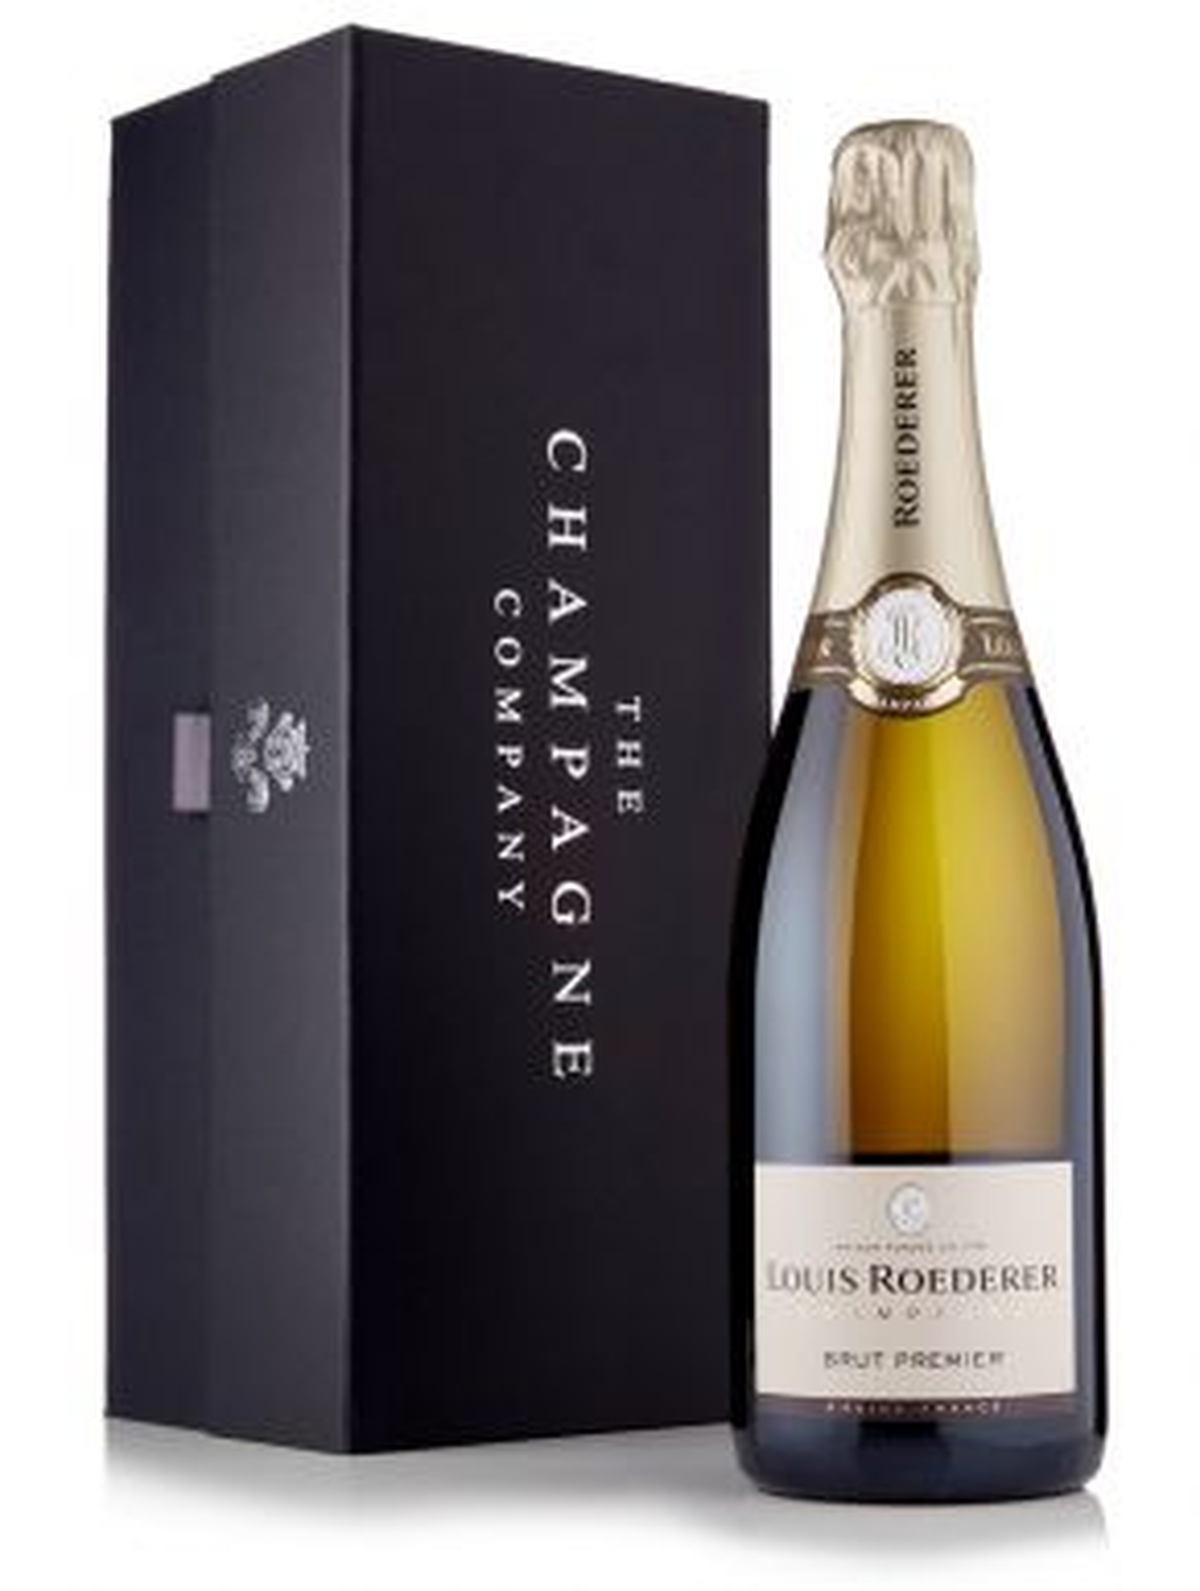 Louis Roederer Brut Premier Champagne 75cl Luxury Gift Box